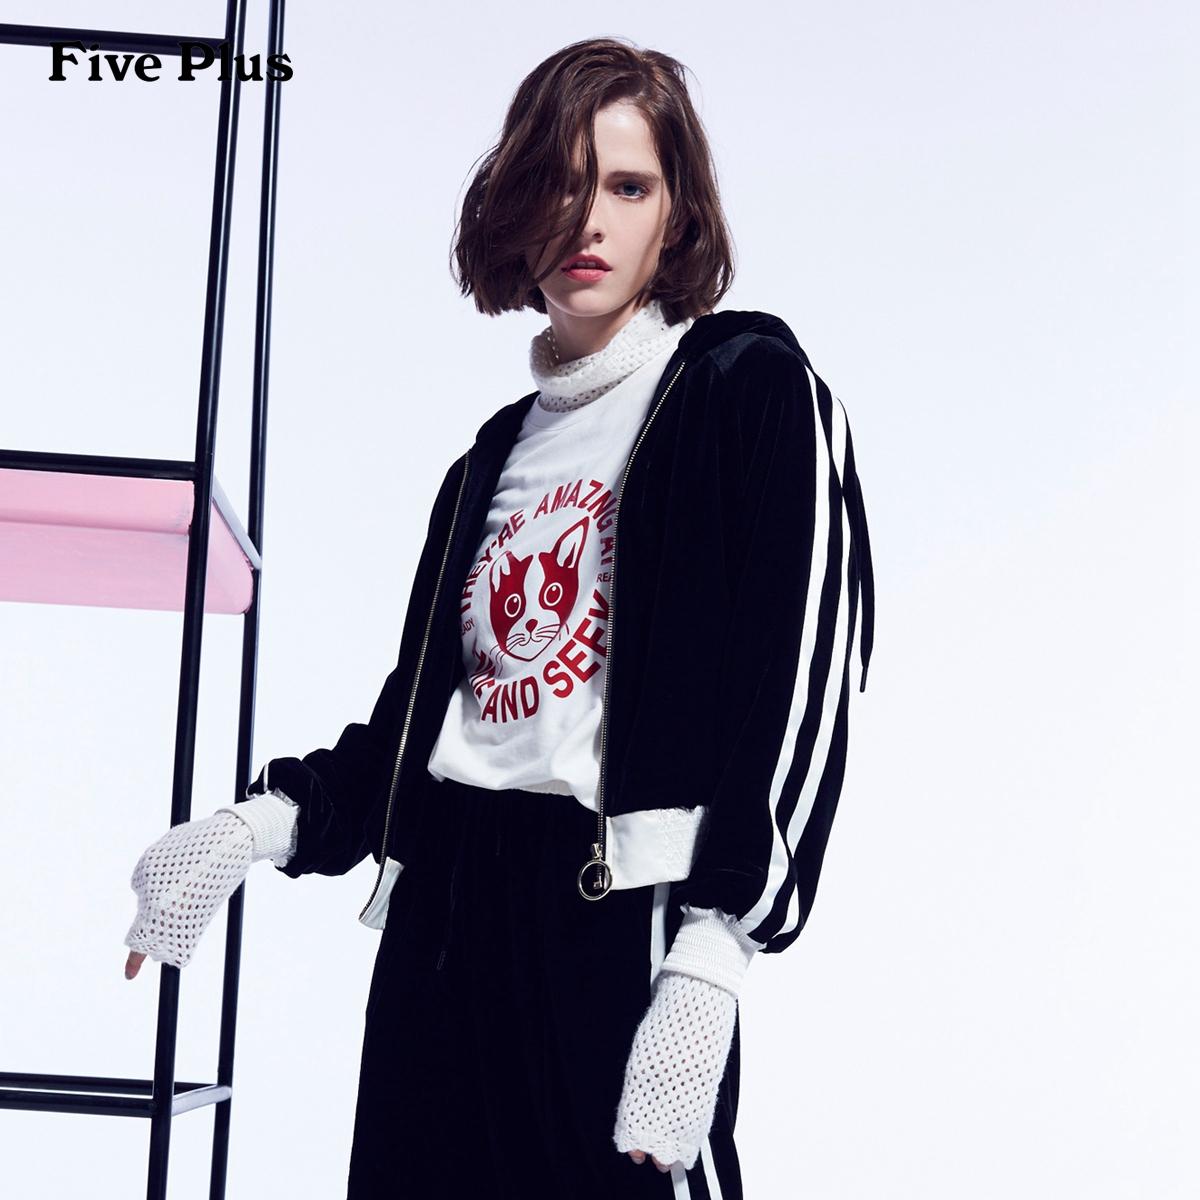 Five Plus2018新款女裝衛衣運動服女條紋連帽絲絨外套潮長袖街頭